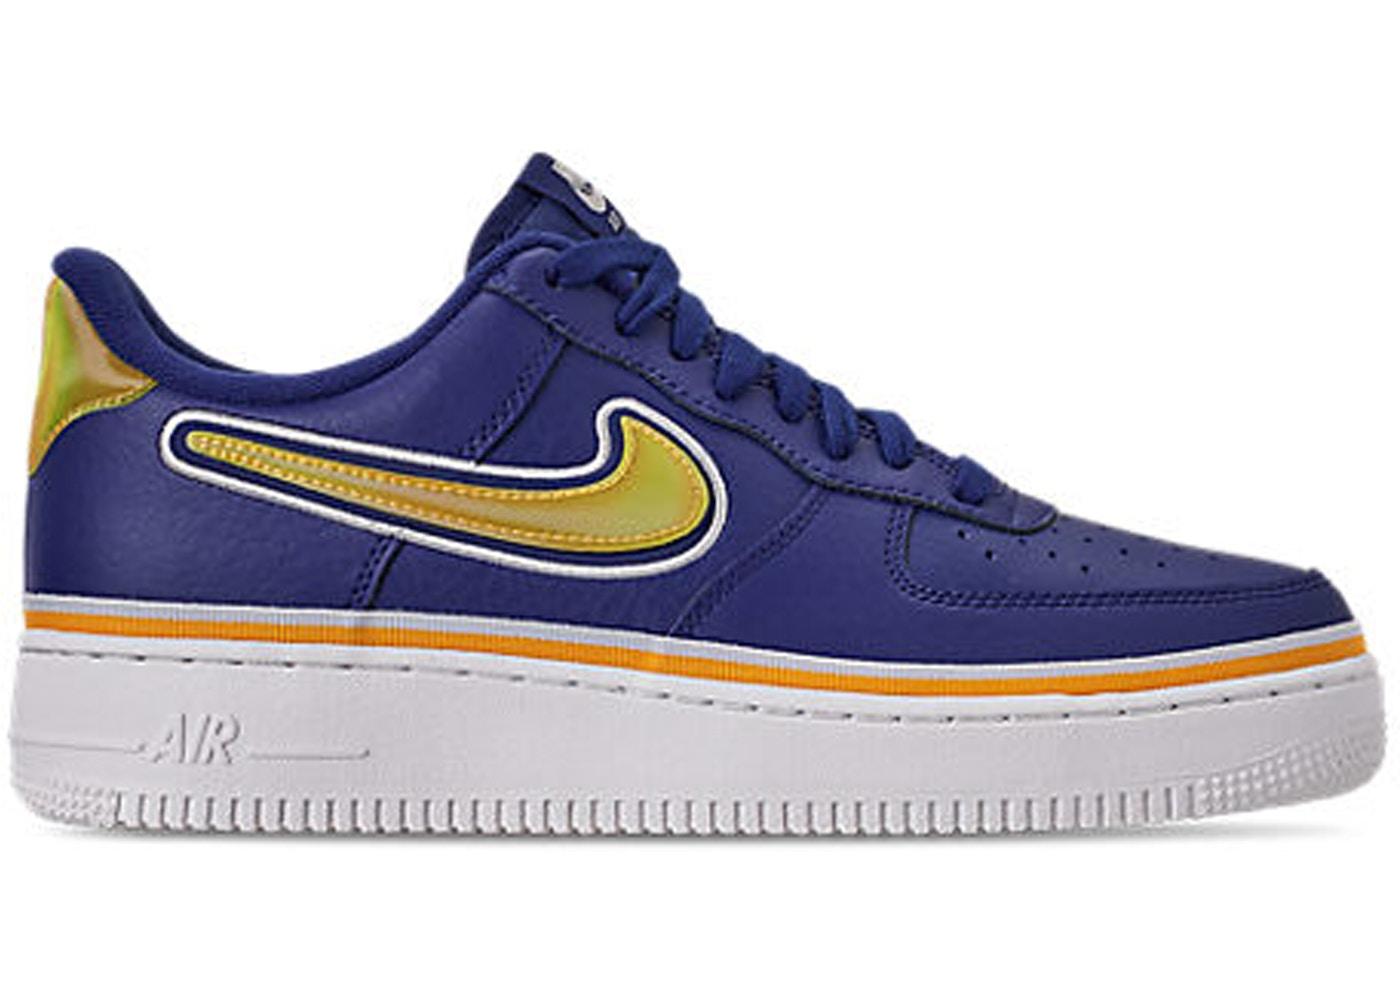 sports shoes 92c77 97320 Air Force 1 Low Sport NBA Deep Royal University Gold - AJ7748-400